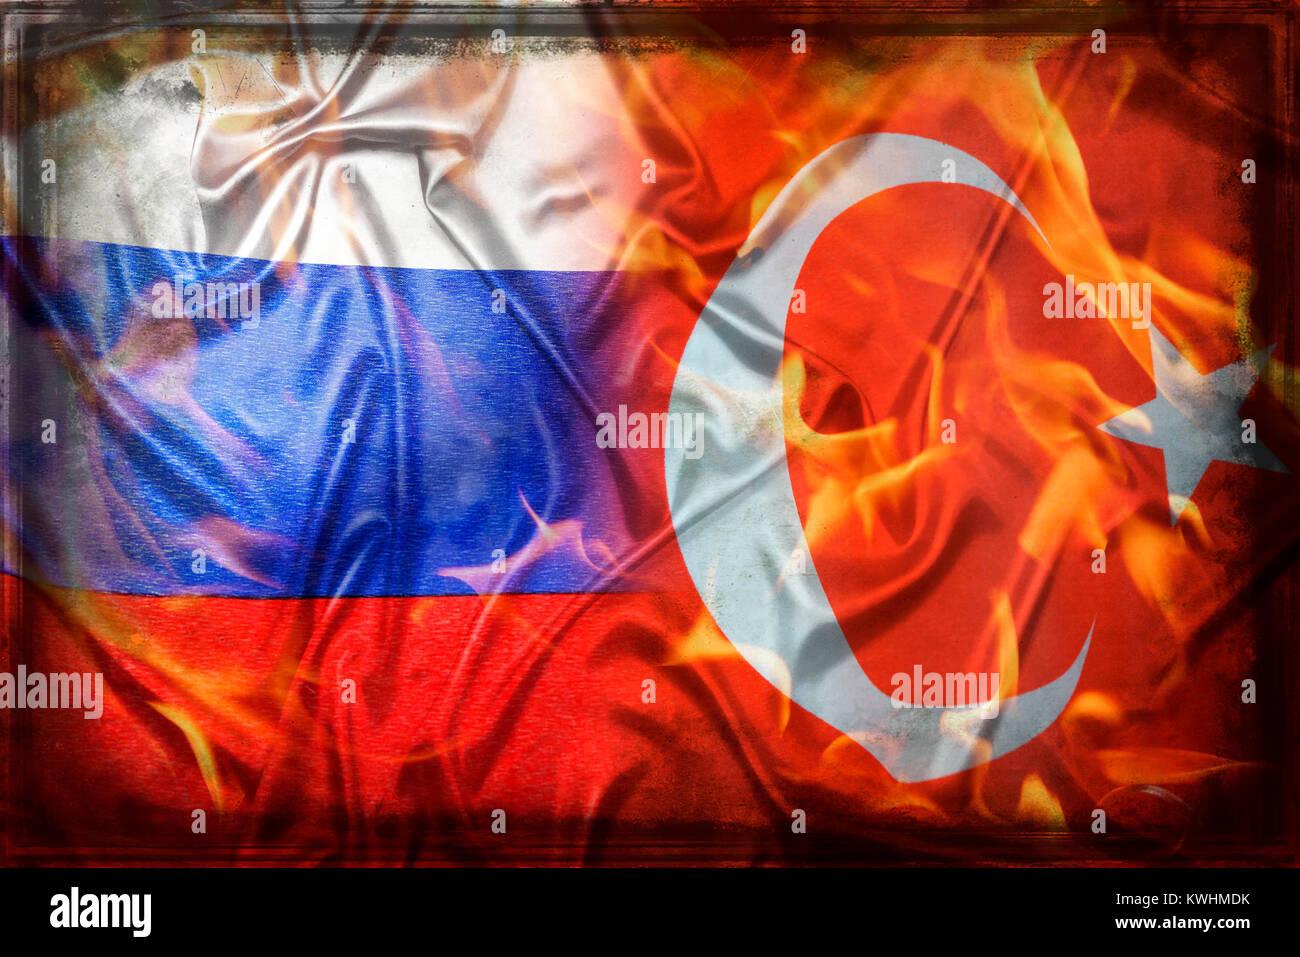 Flags of Turkey and Russia with flames, crisis between Russia and Turkey, Fahnen von Tuerkei und Russland mit Flammen, - Stock Image